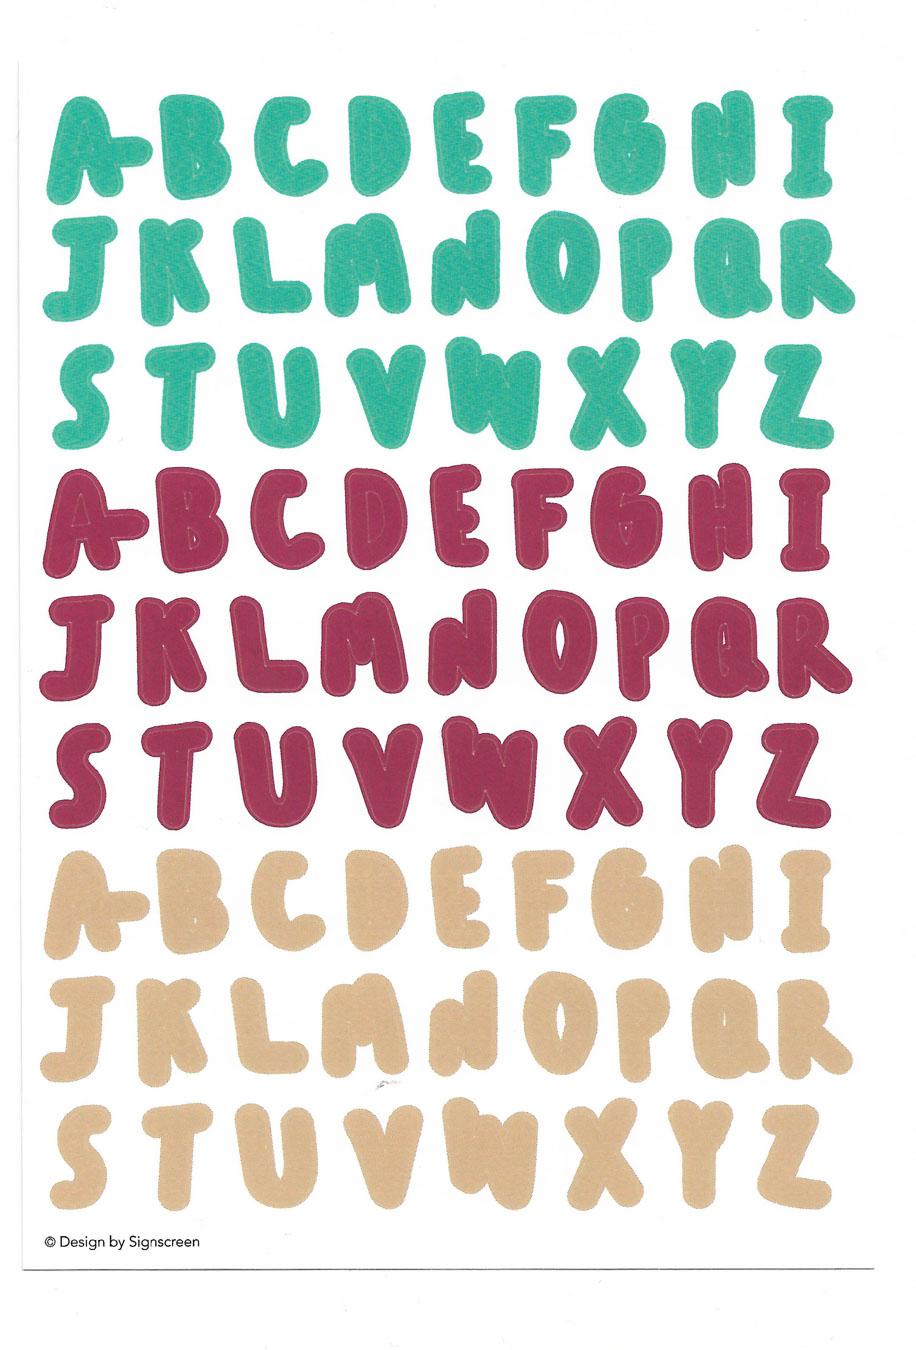 A-Z Sticker (Green Red Cream)